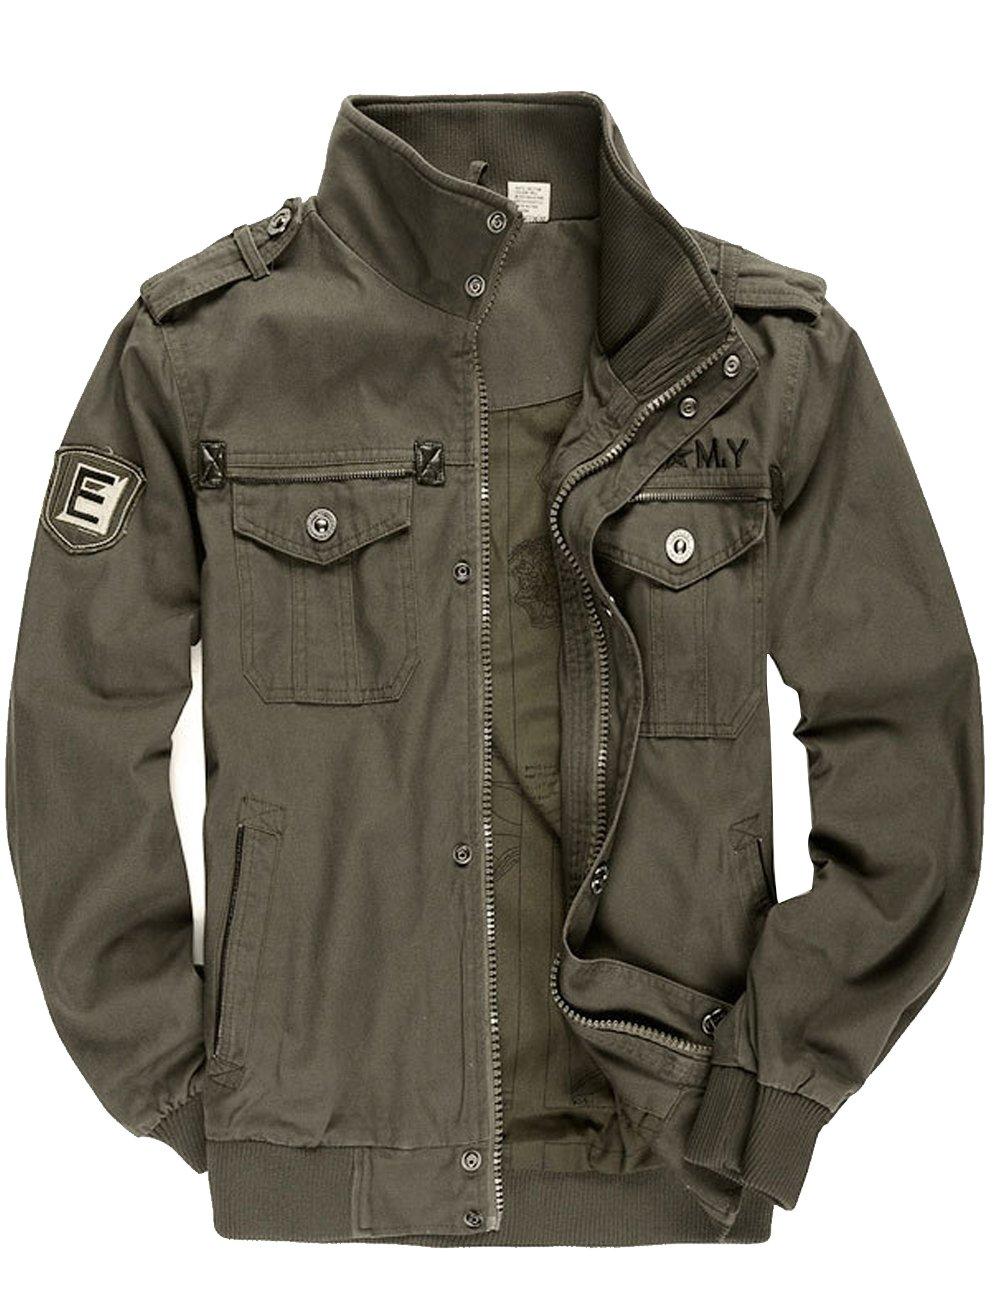 8fa7d95dd Men's Windbreaker Jacket Stand Collar Cotton Military Tactical ...